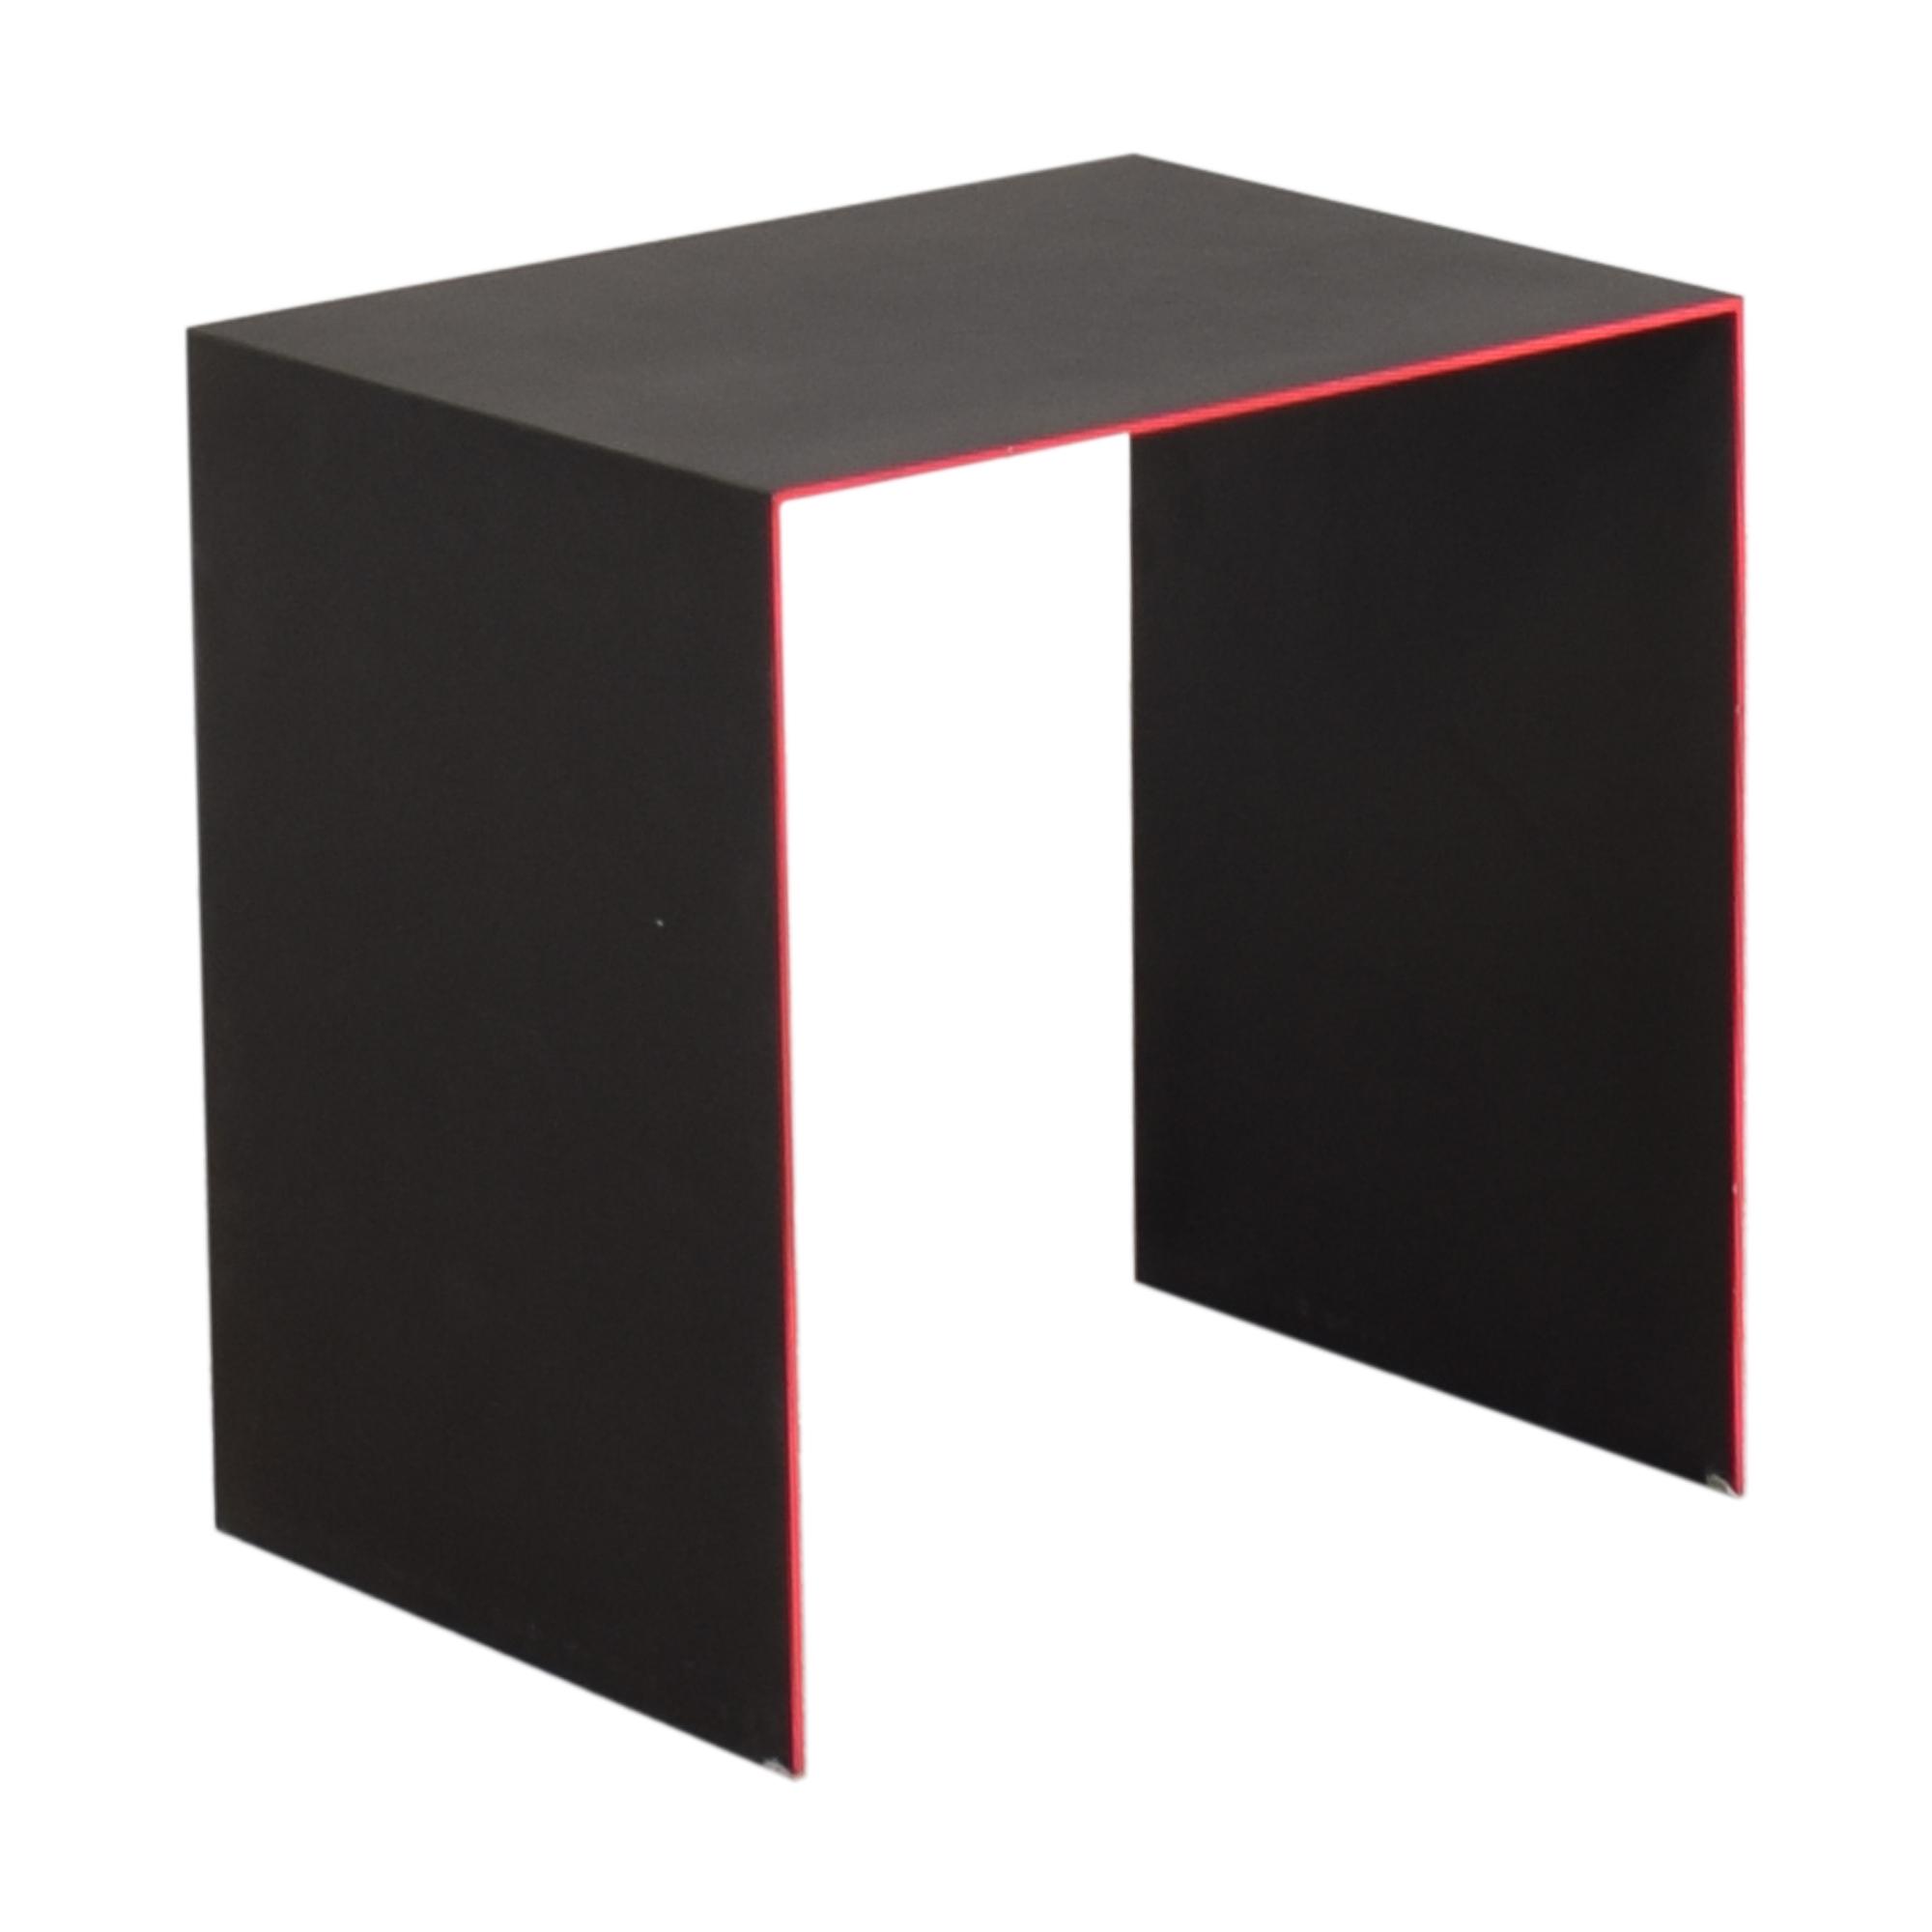 shop ABC Carpet & Home abcDNA Fluid Steel End Table ABC Carpet & Home Tables